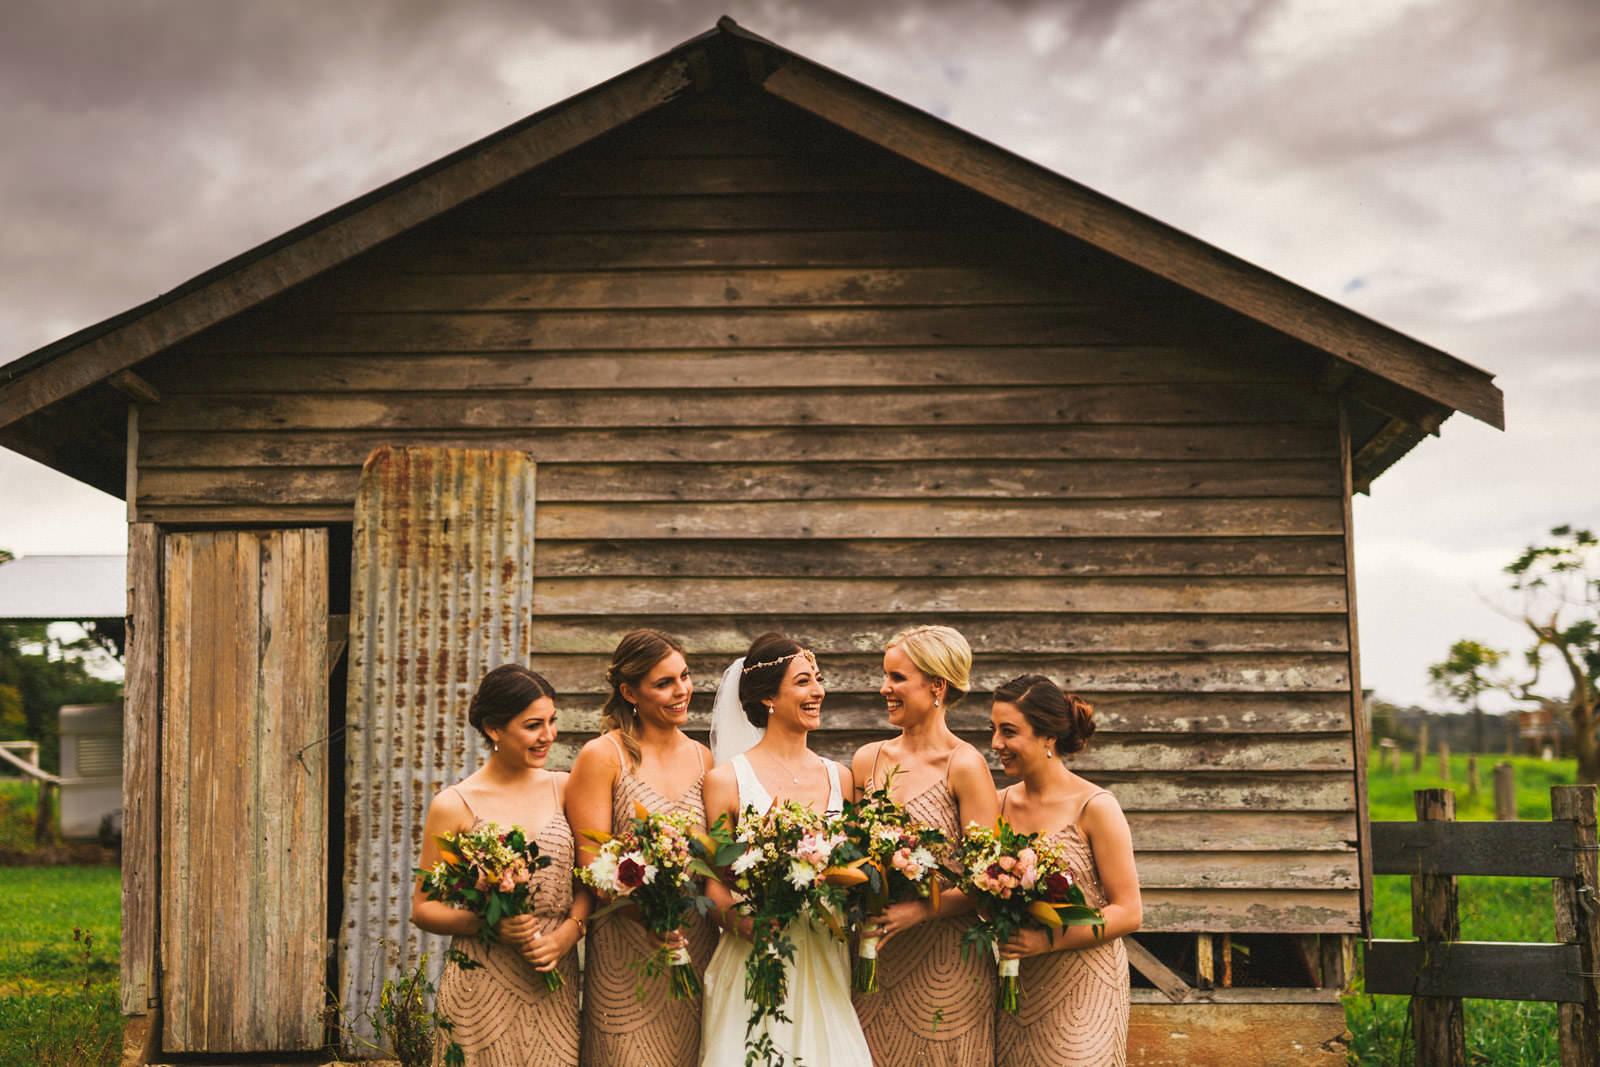 tablelands_wedding_0031